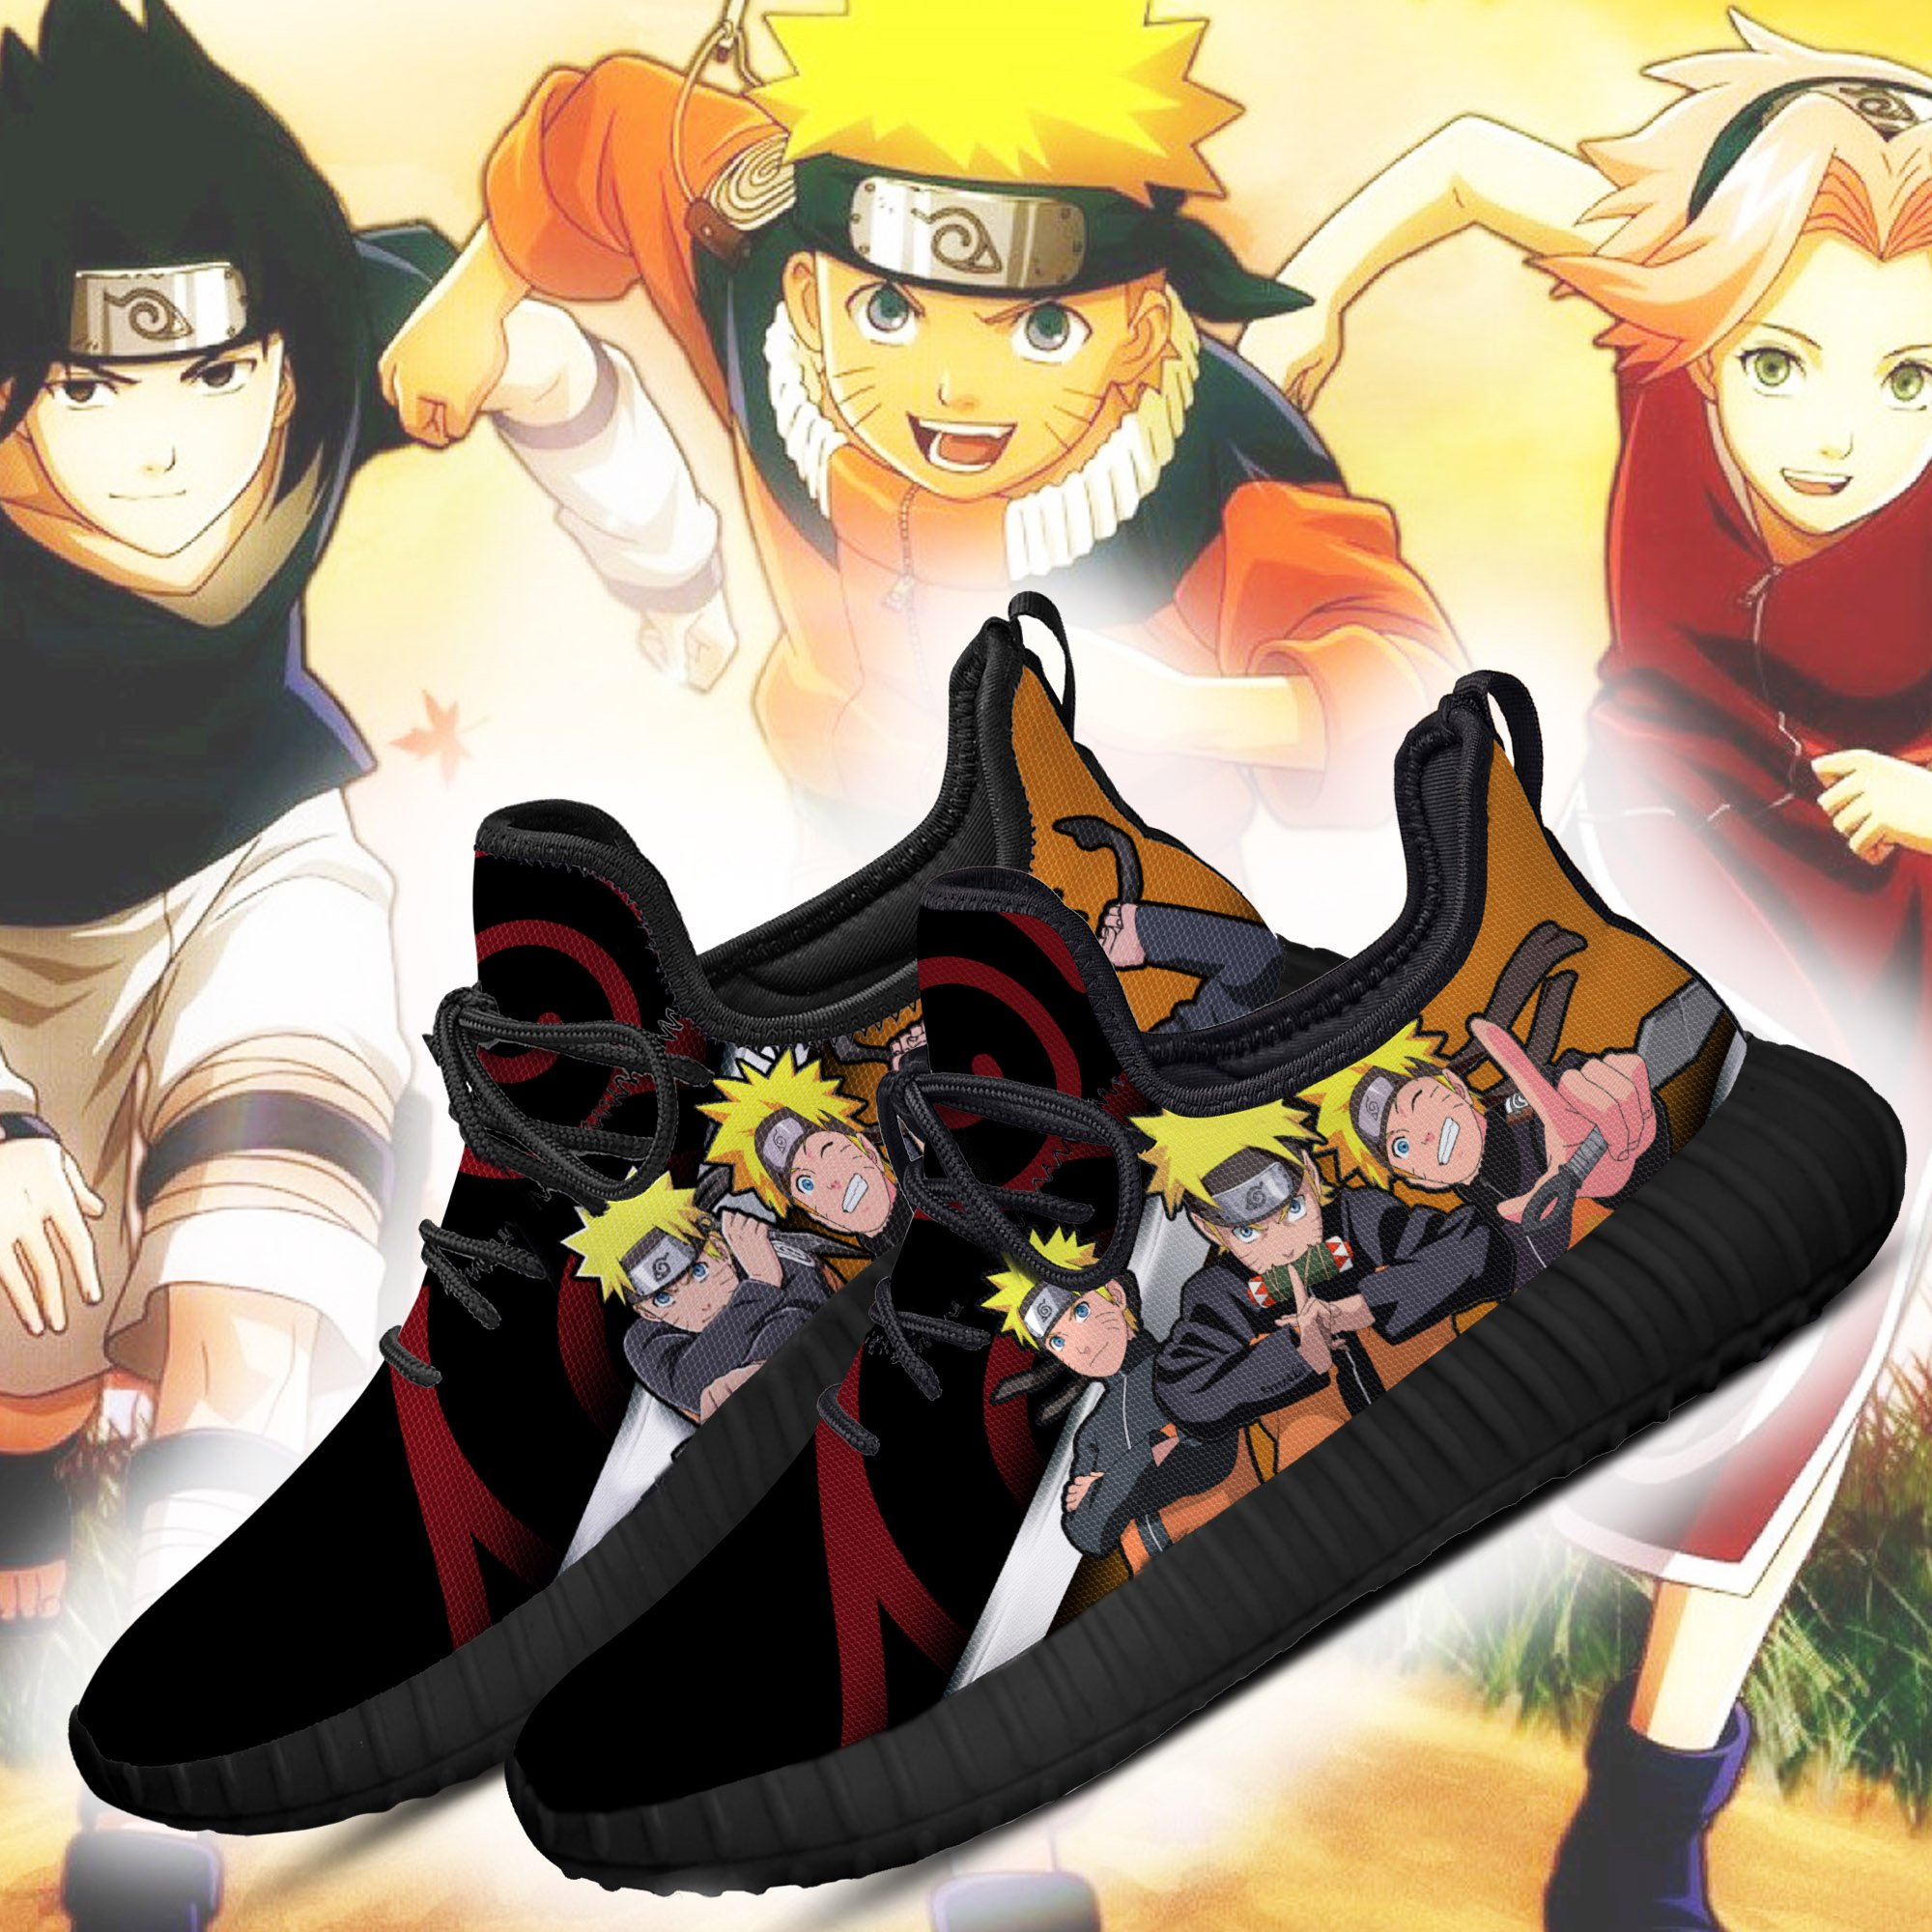 Naruto Reze Shoes Naruto Anime Shoes Fan Gift Idea Tt04 Tazazoncom    Rakuprints